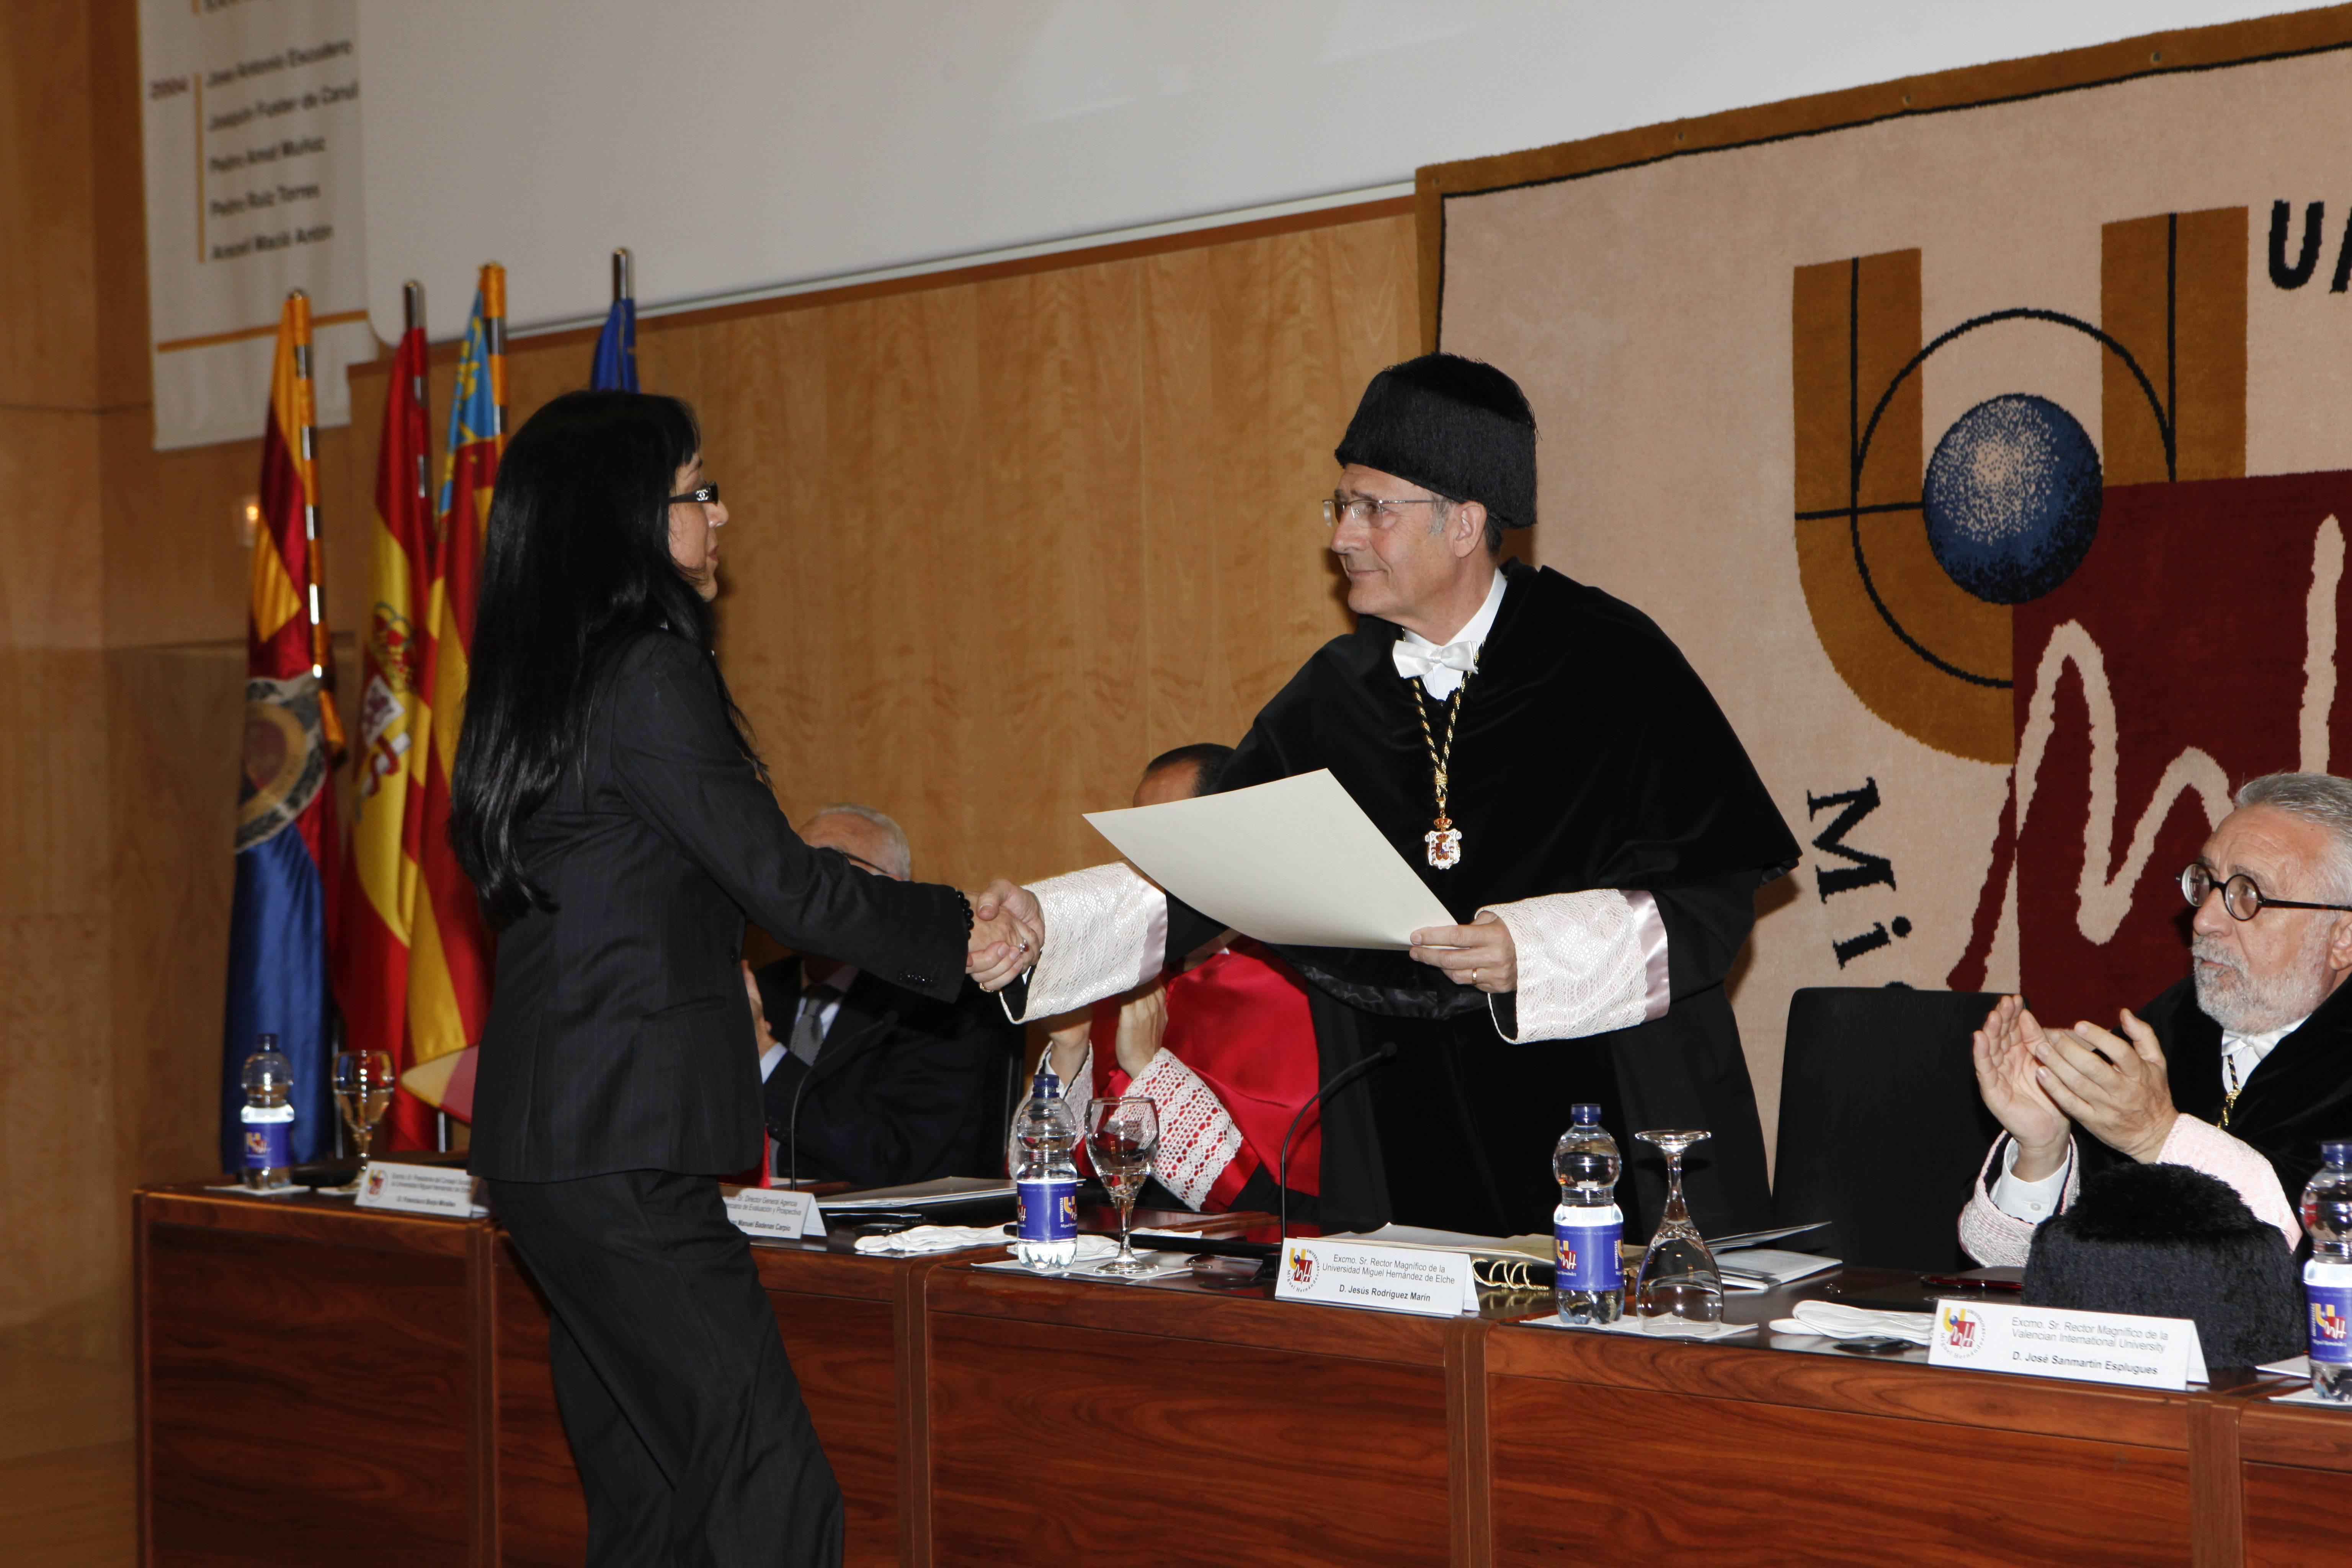 doctor-honoris-causa-luis-gamir_mg_1039.jpg